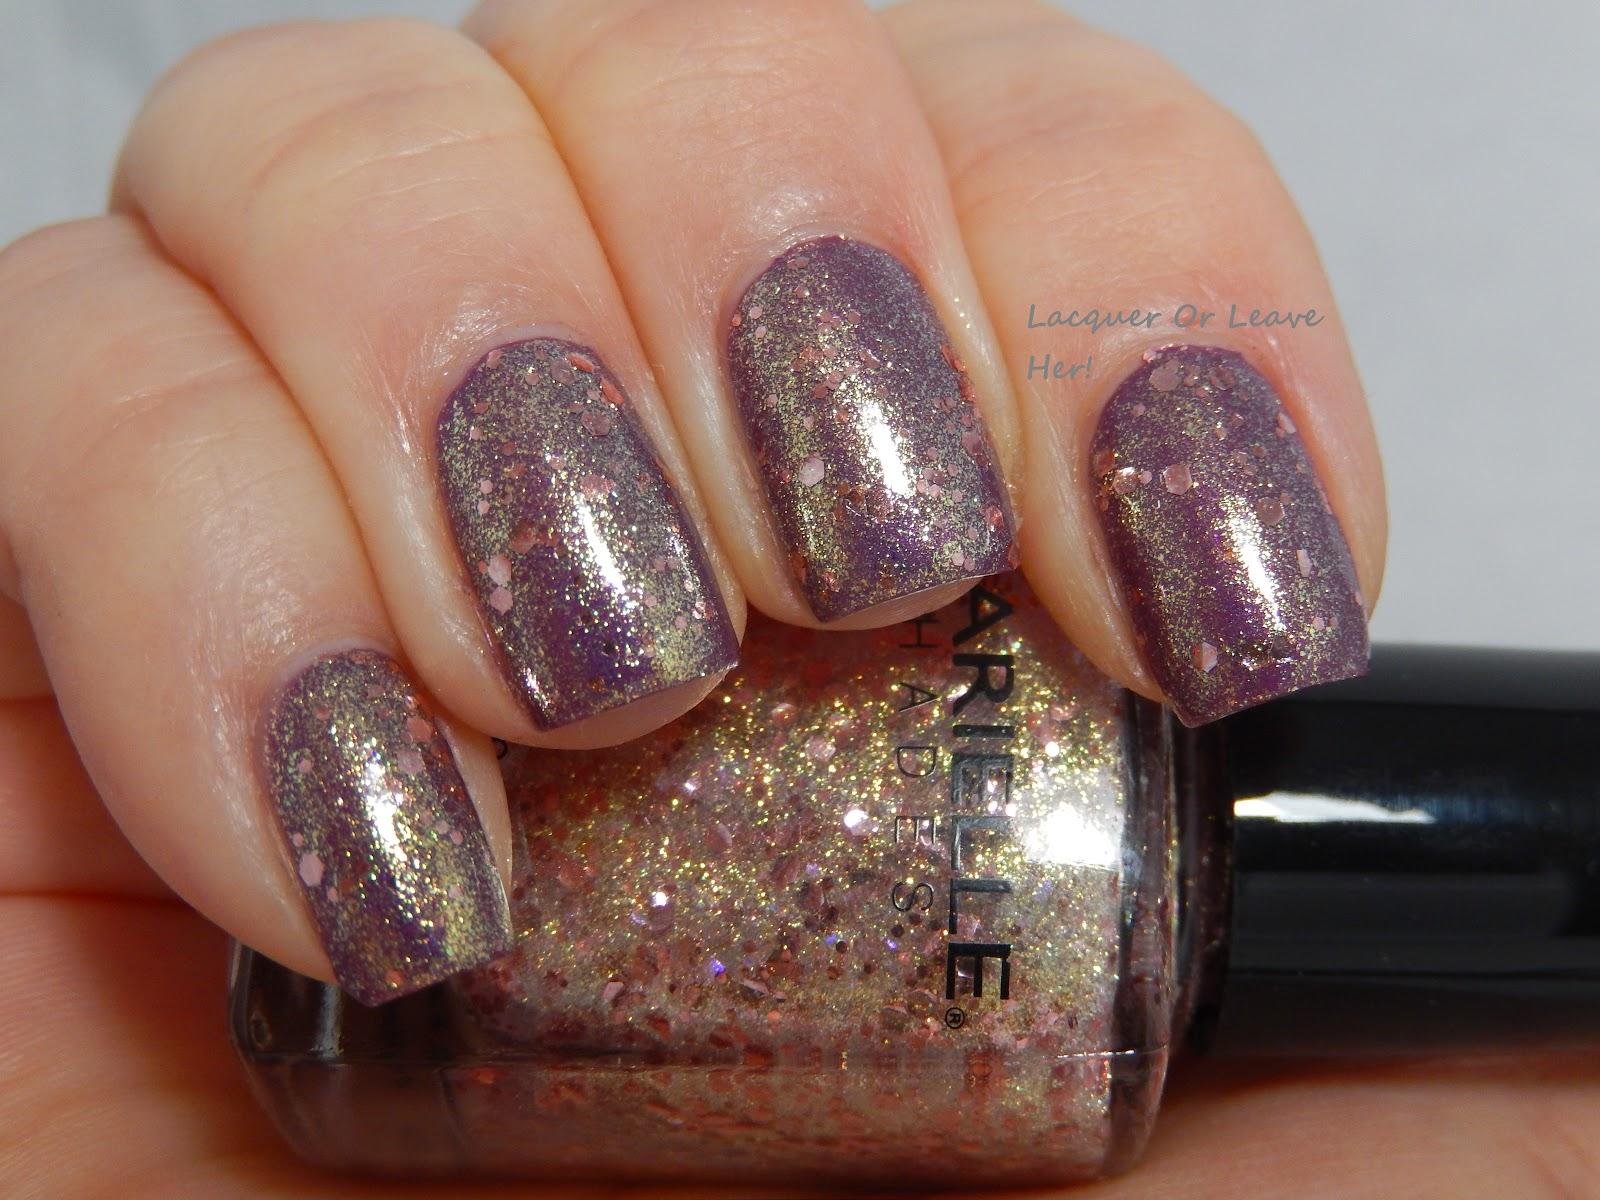 Barielle Golden Halo over Finger Paints Magenta Mural